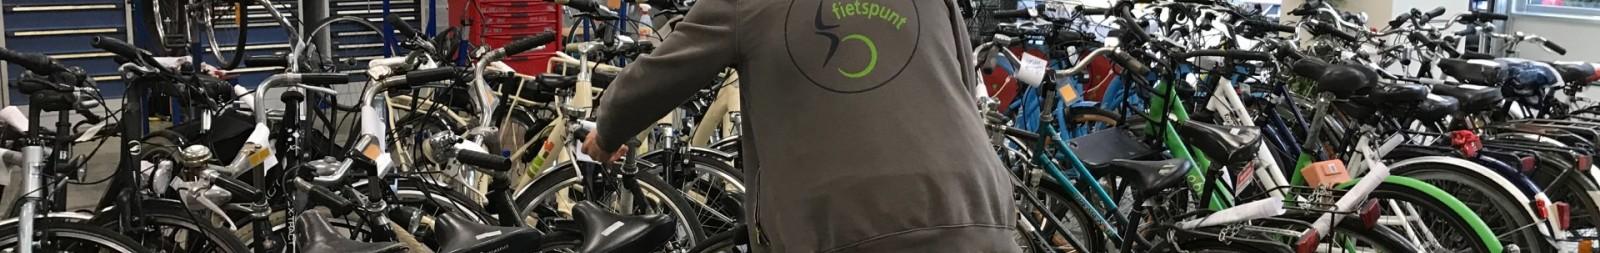 fietspunten_website.jpg